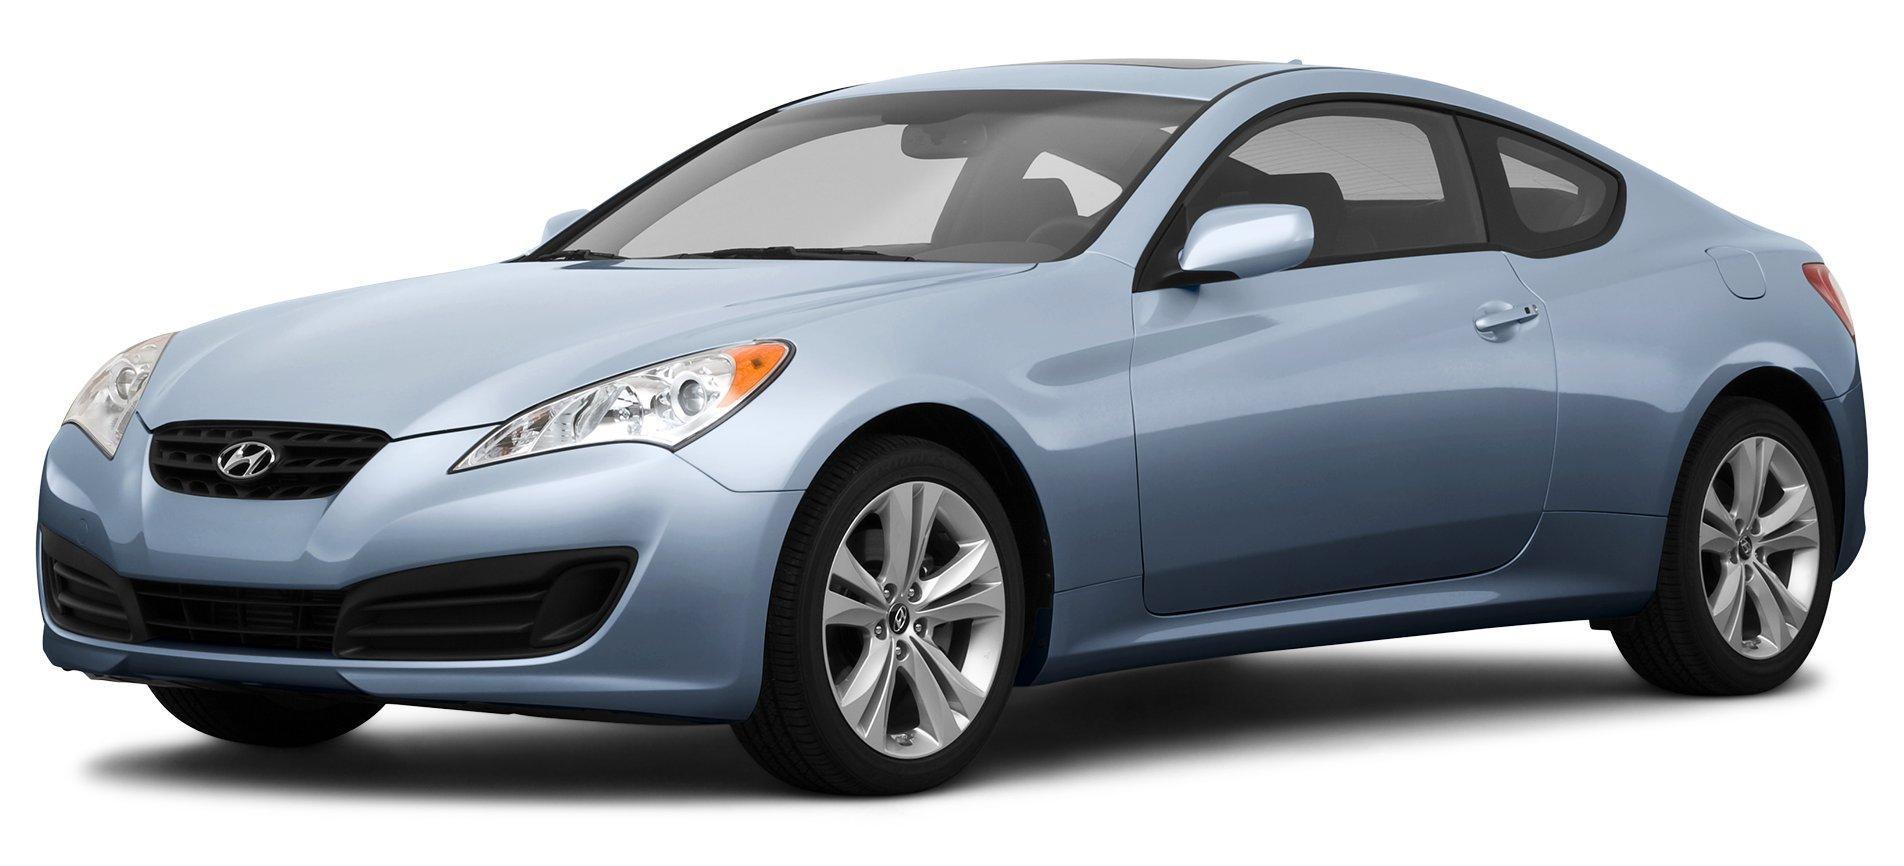 2010 Hyundai Genesis Coupe, 2-Door 2.0T Automatic Transmission ...